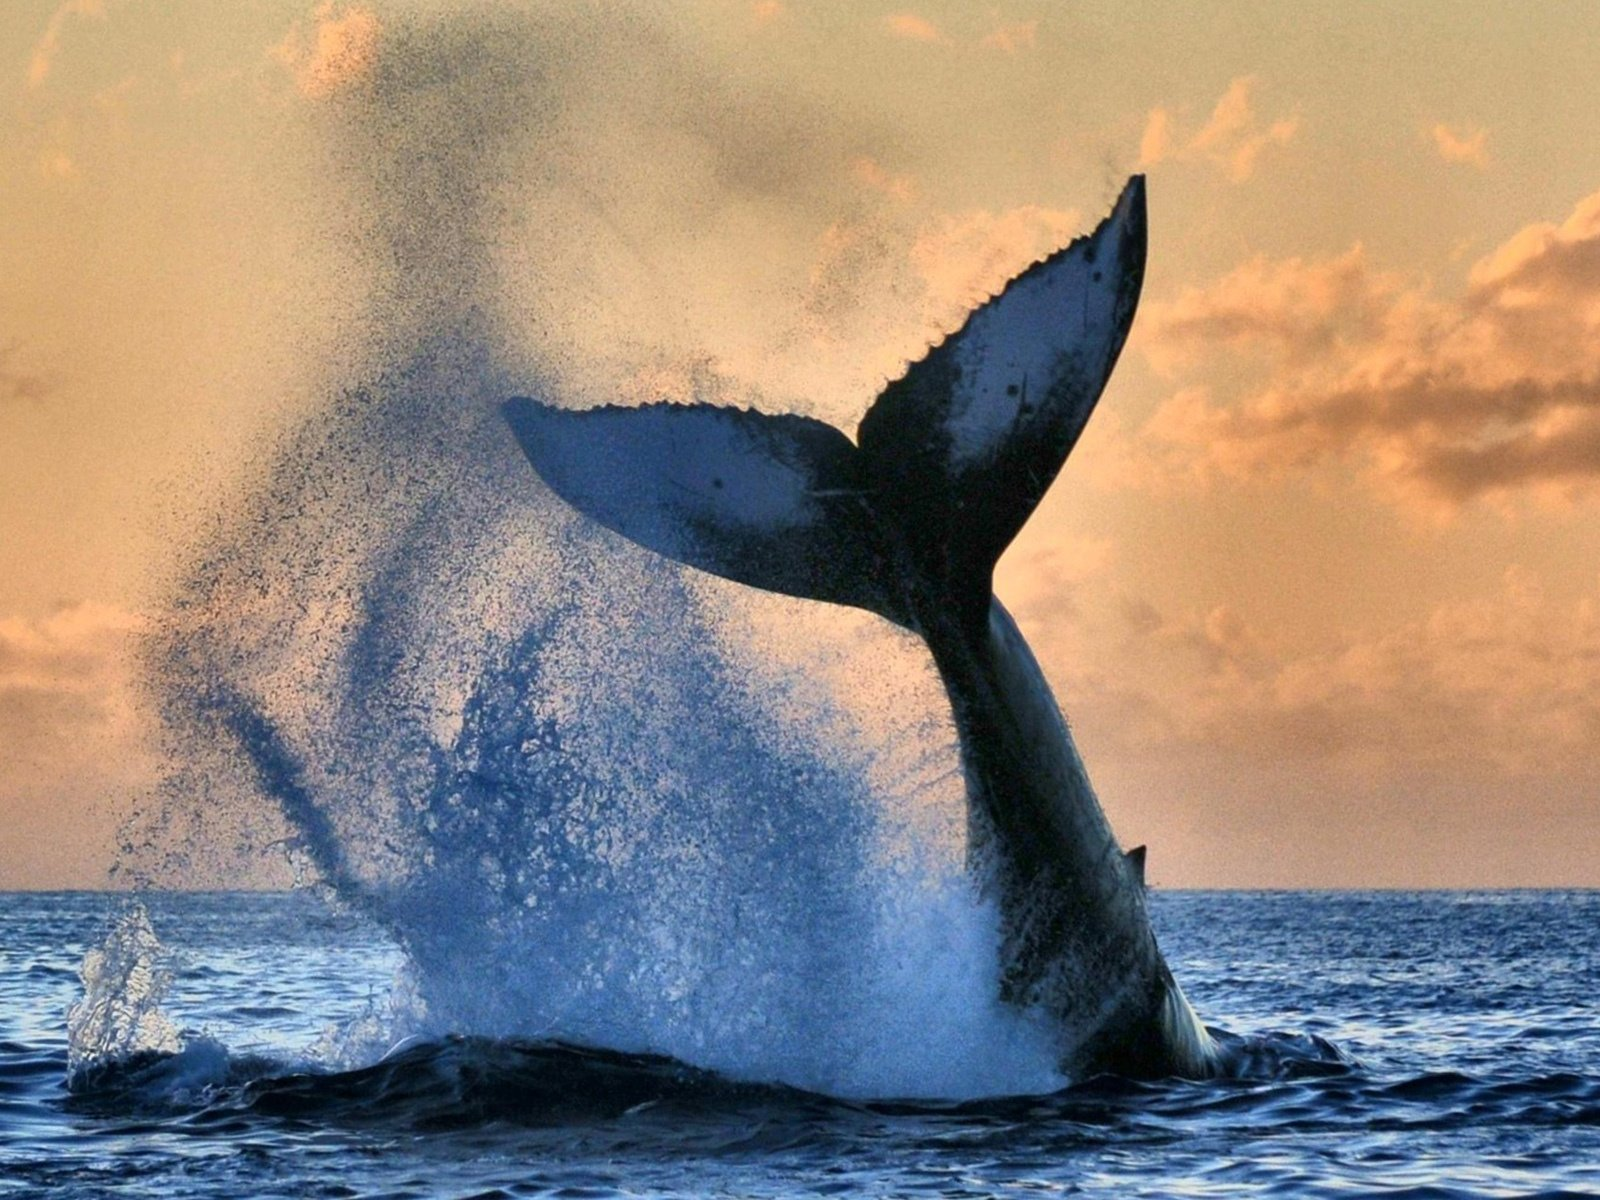 хвост кита картинки когда